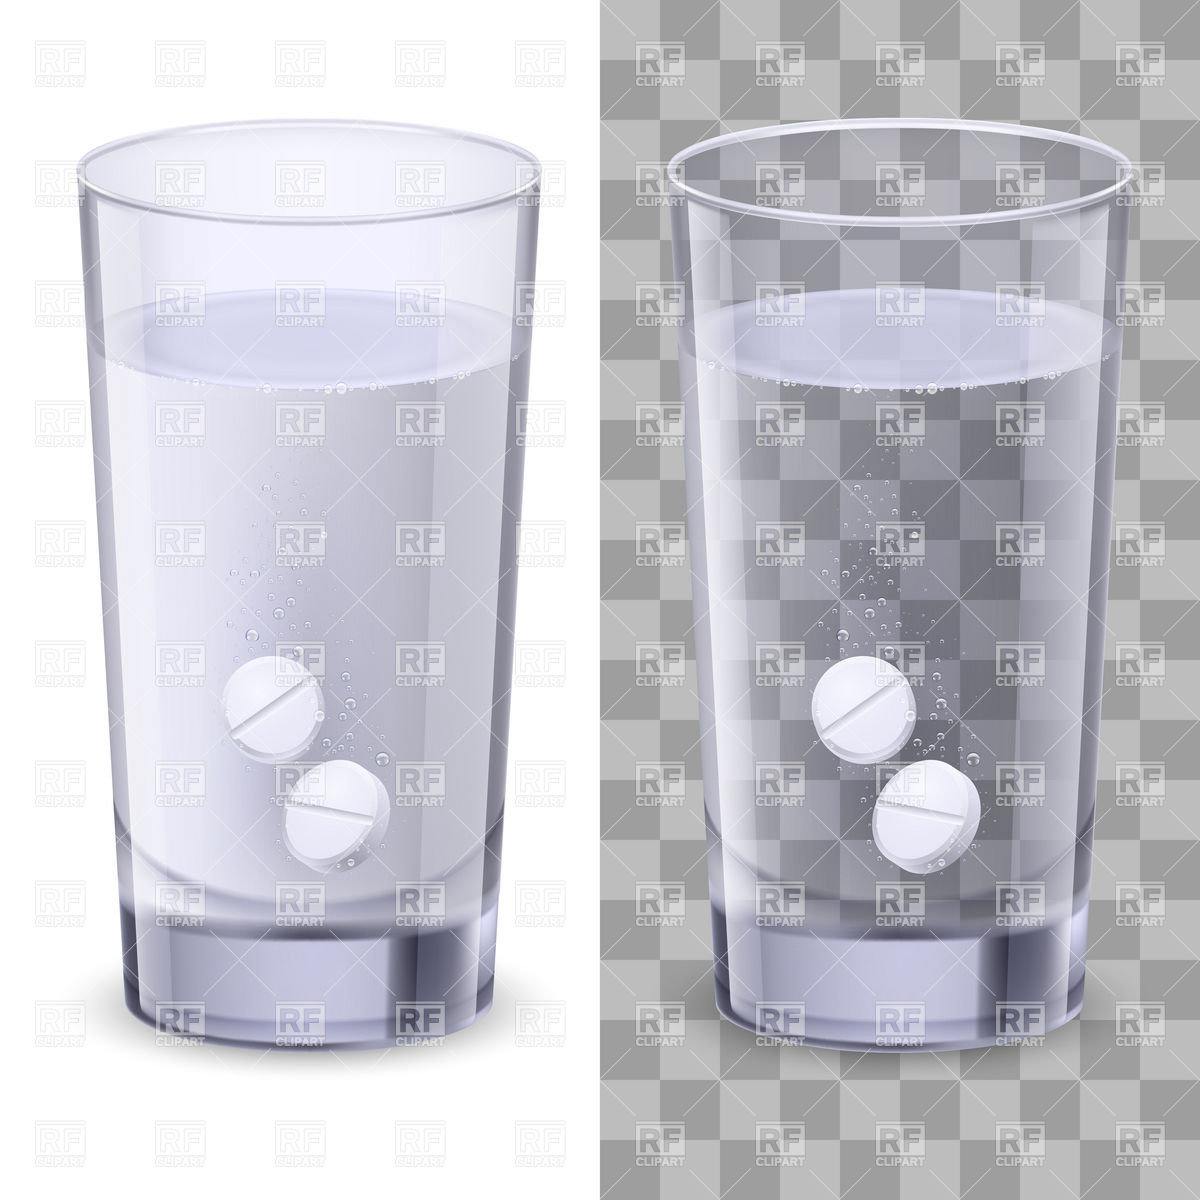 1200x1200 Dissolving Pills In Glass Of Water Vector Image Vector Artwork